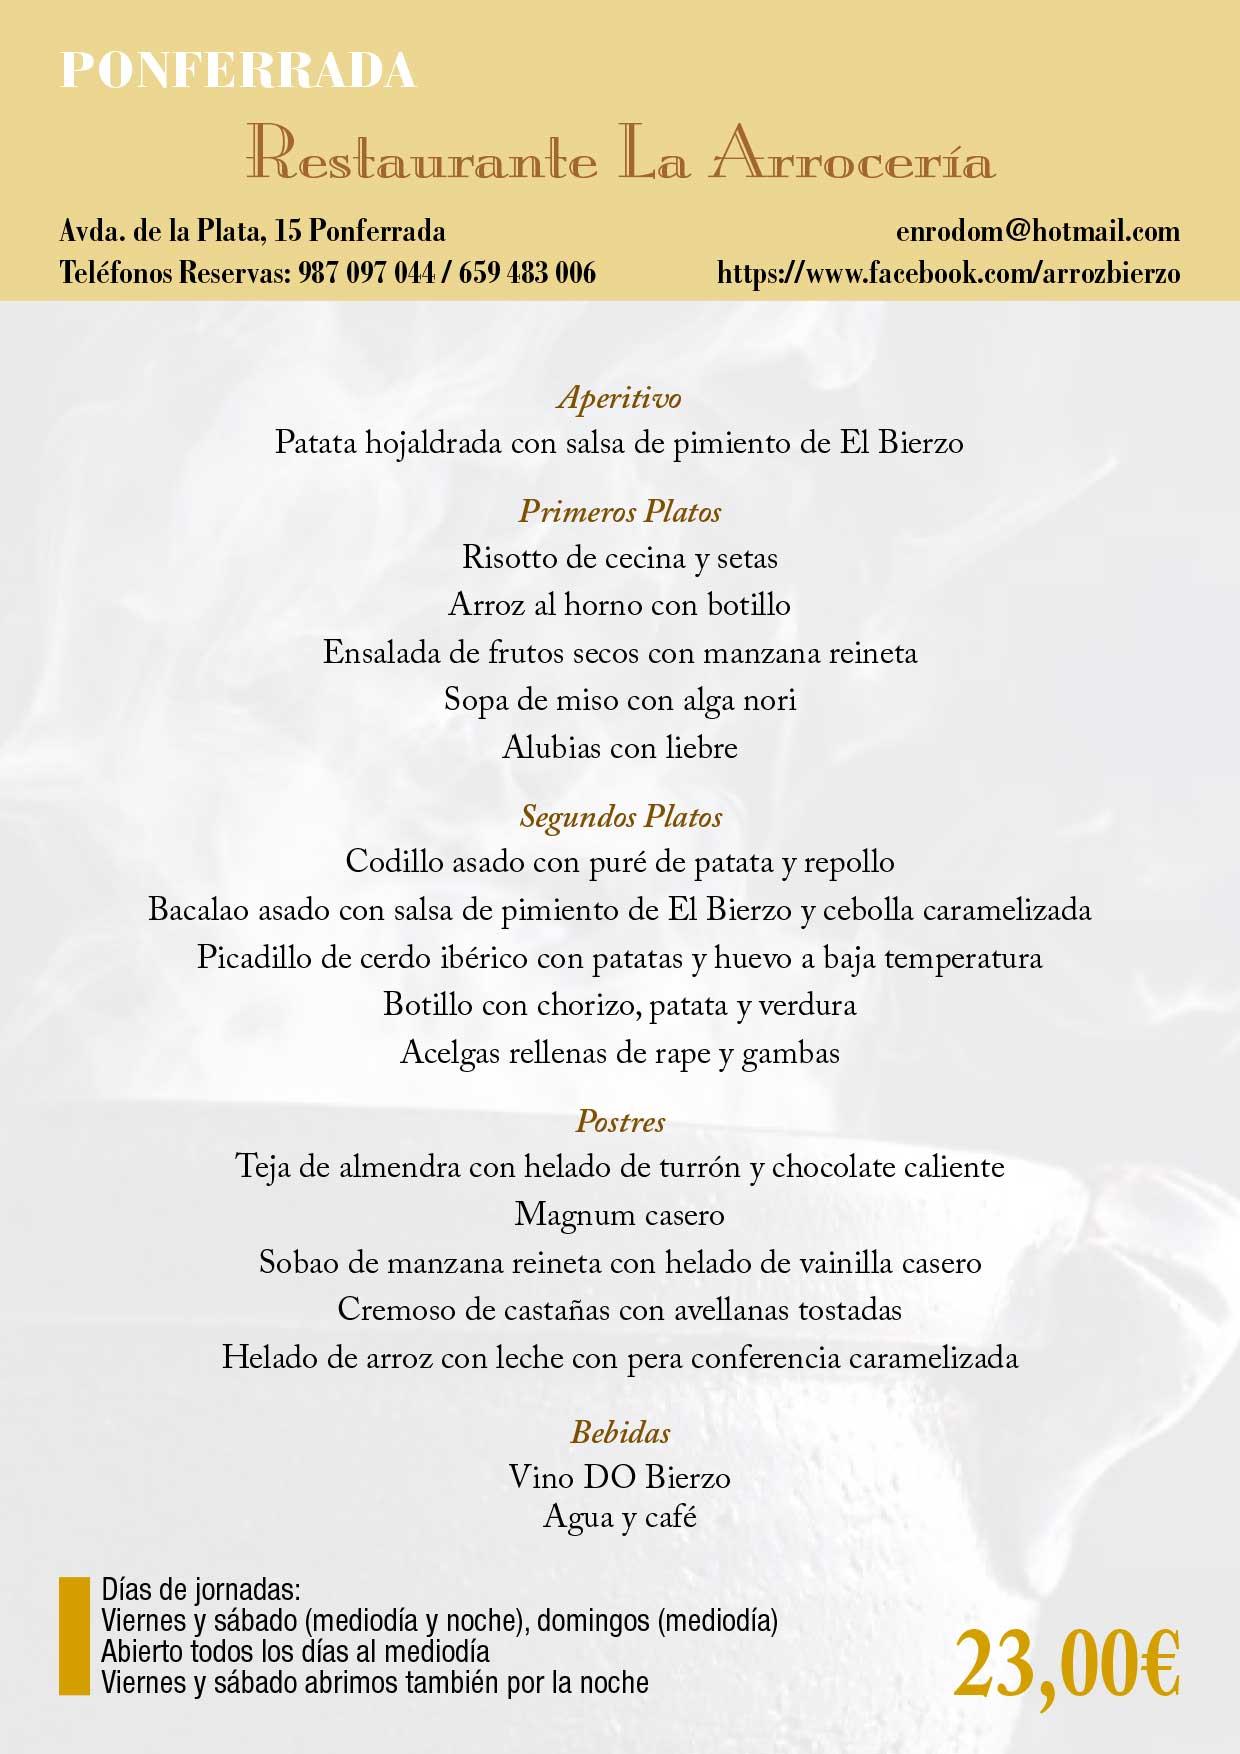 XXXIII Jornadas gastronómicas del Bierzo 2017. Restaurantes participantes 35